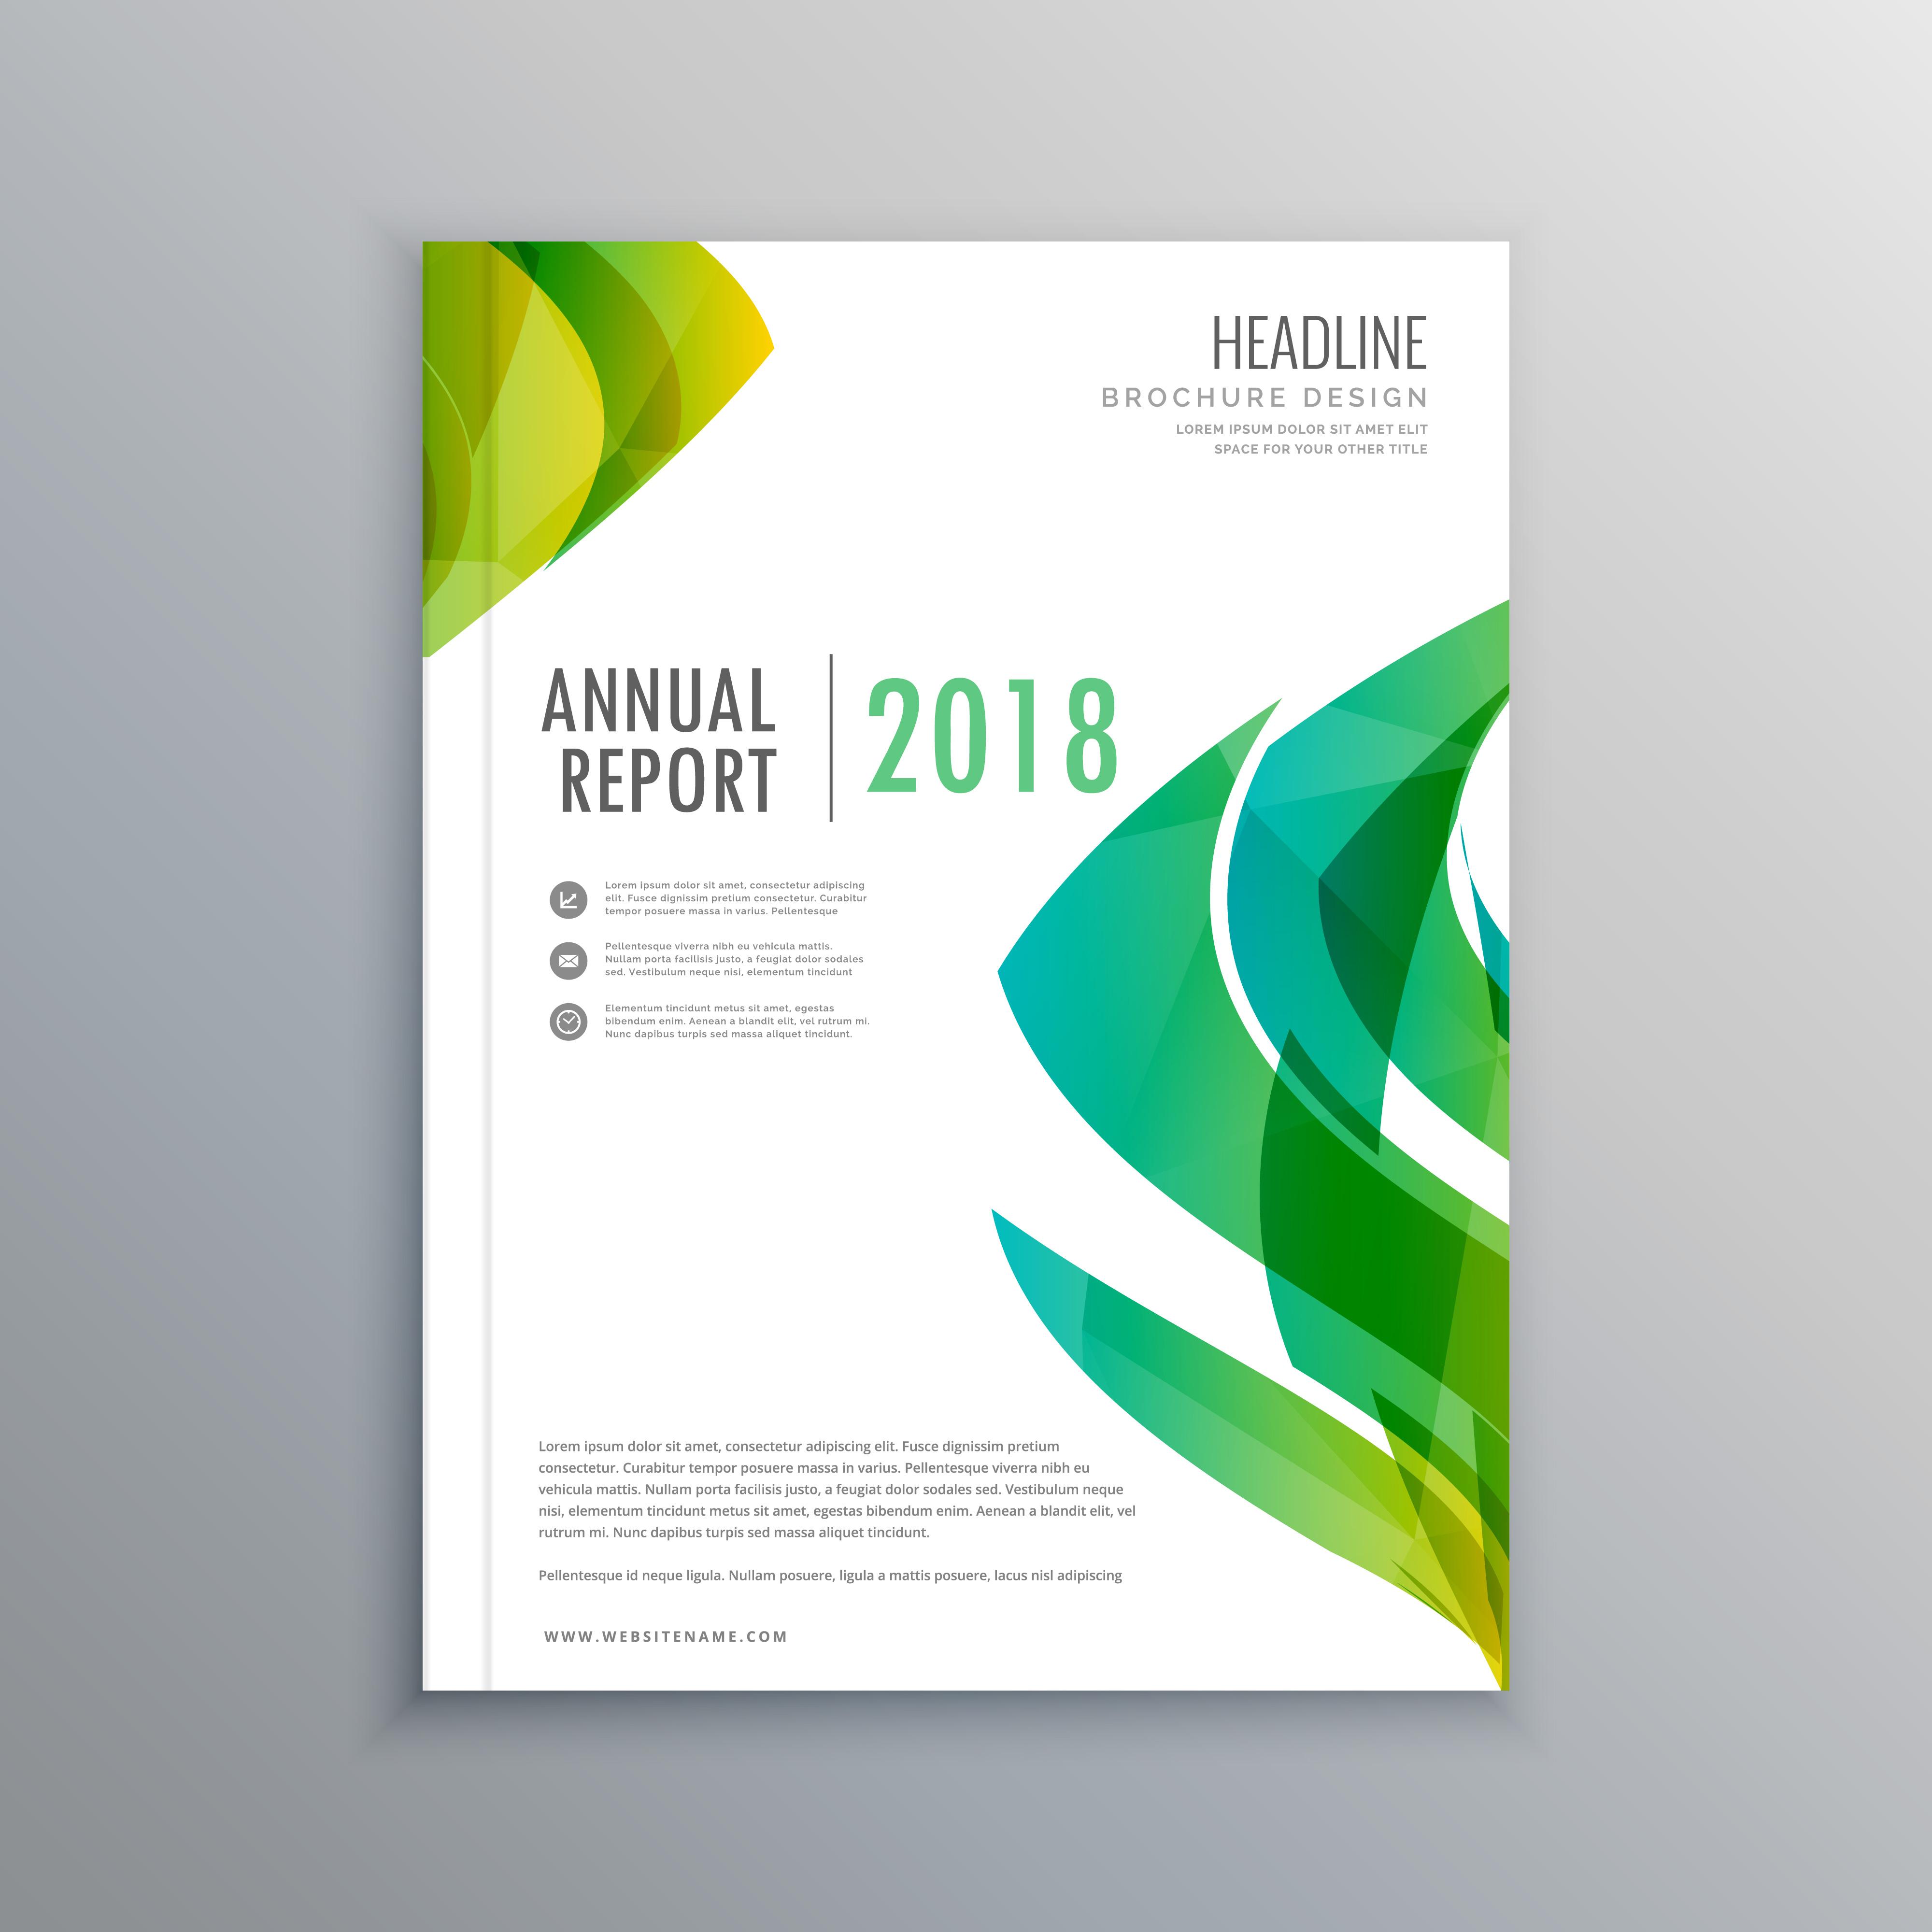 stylish green magazine cover design template - Download ...  stylish green m...